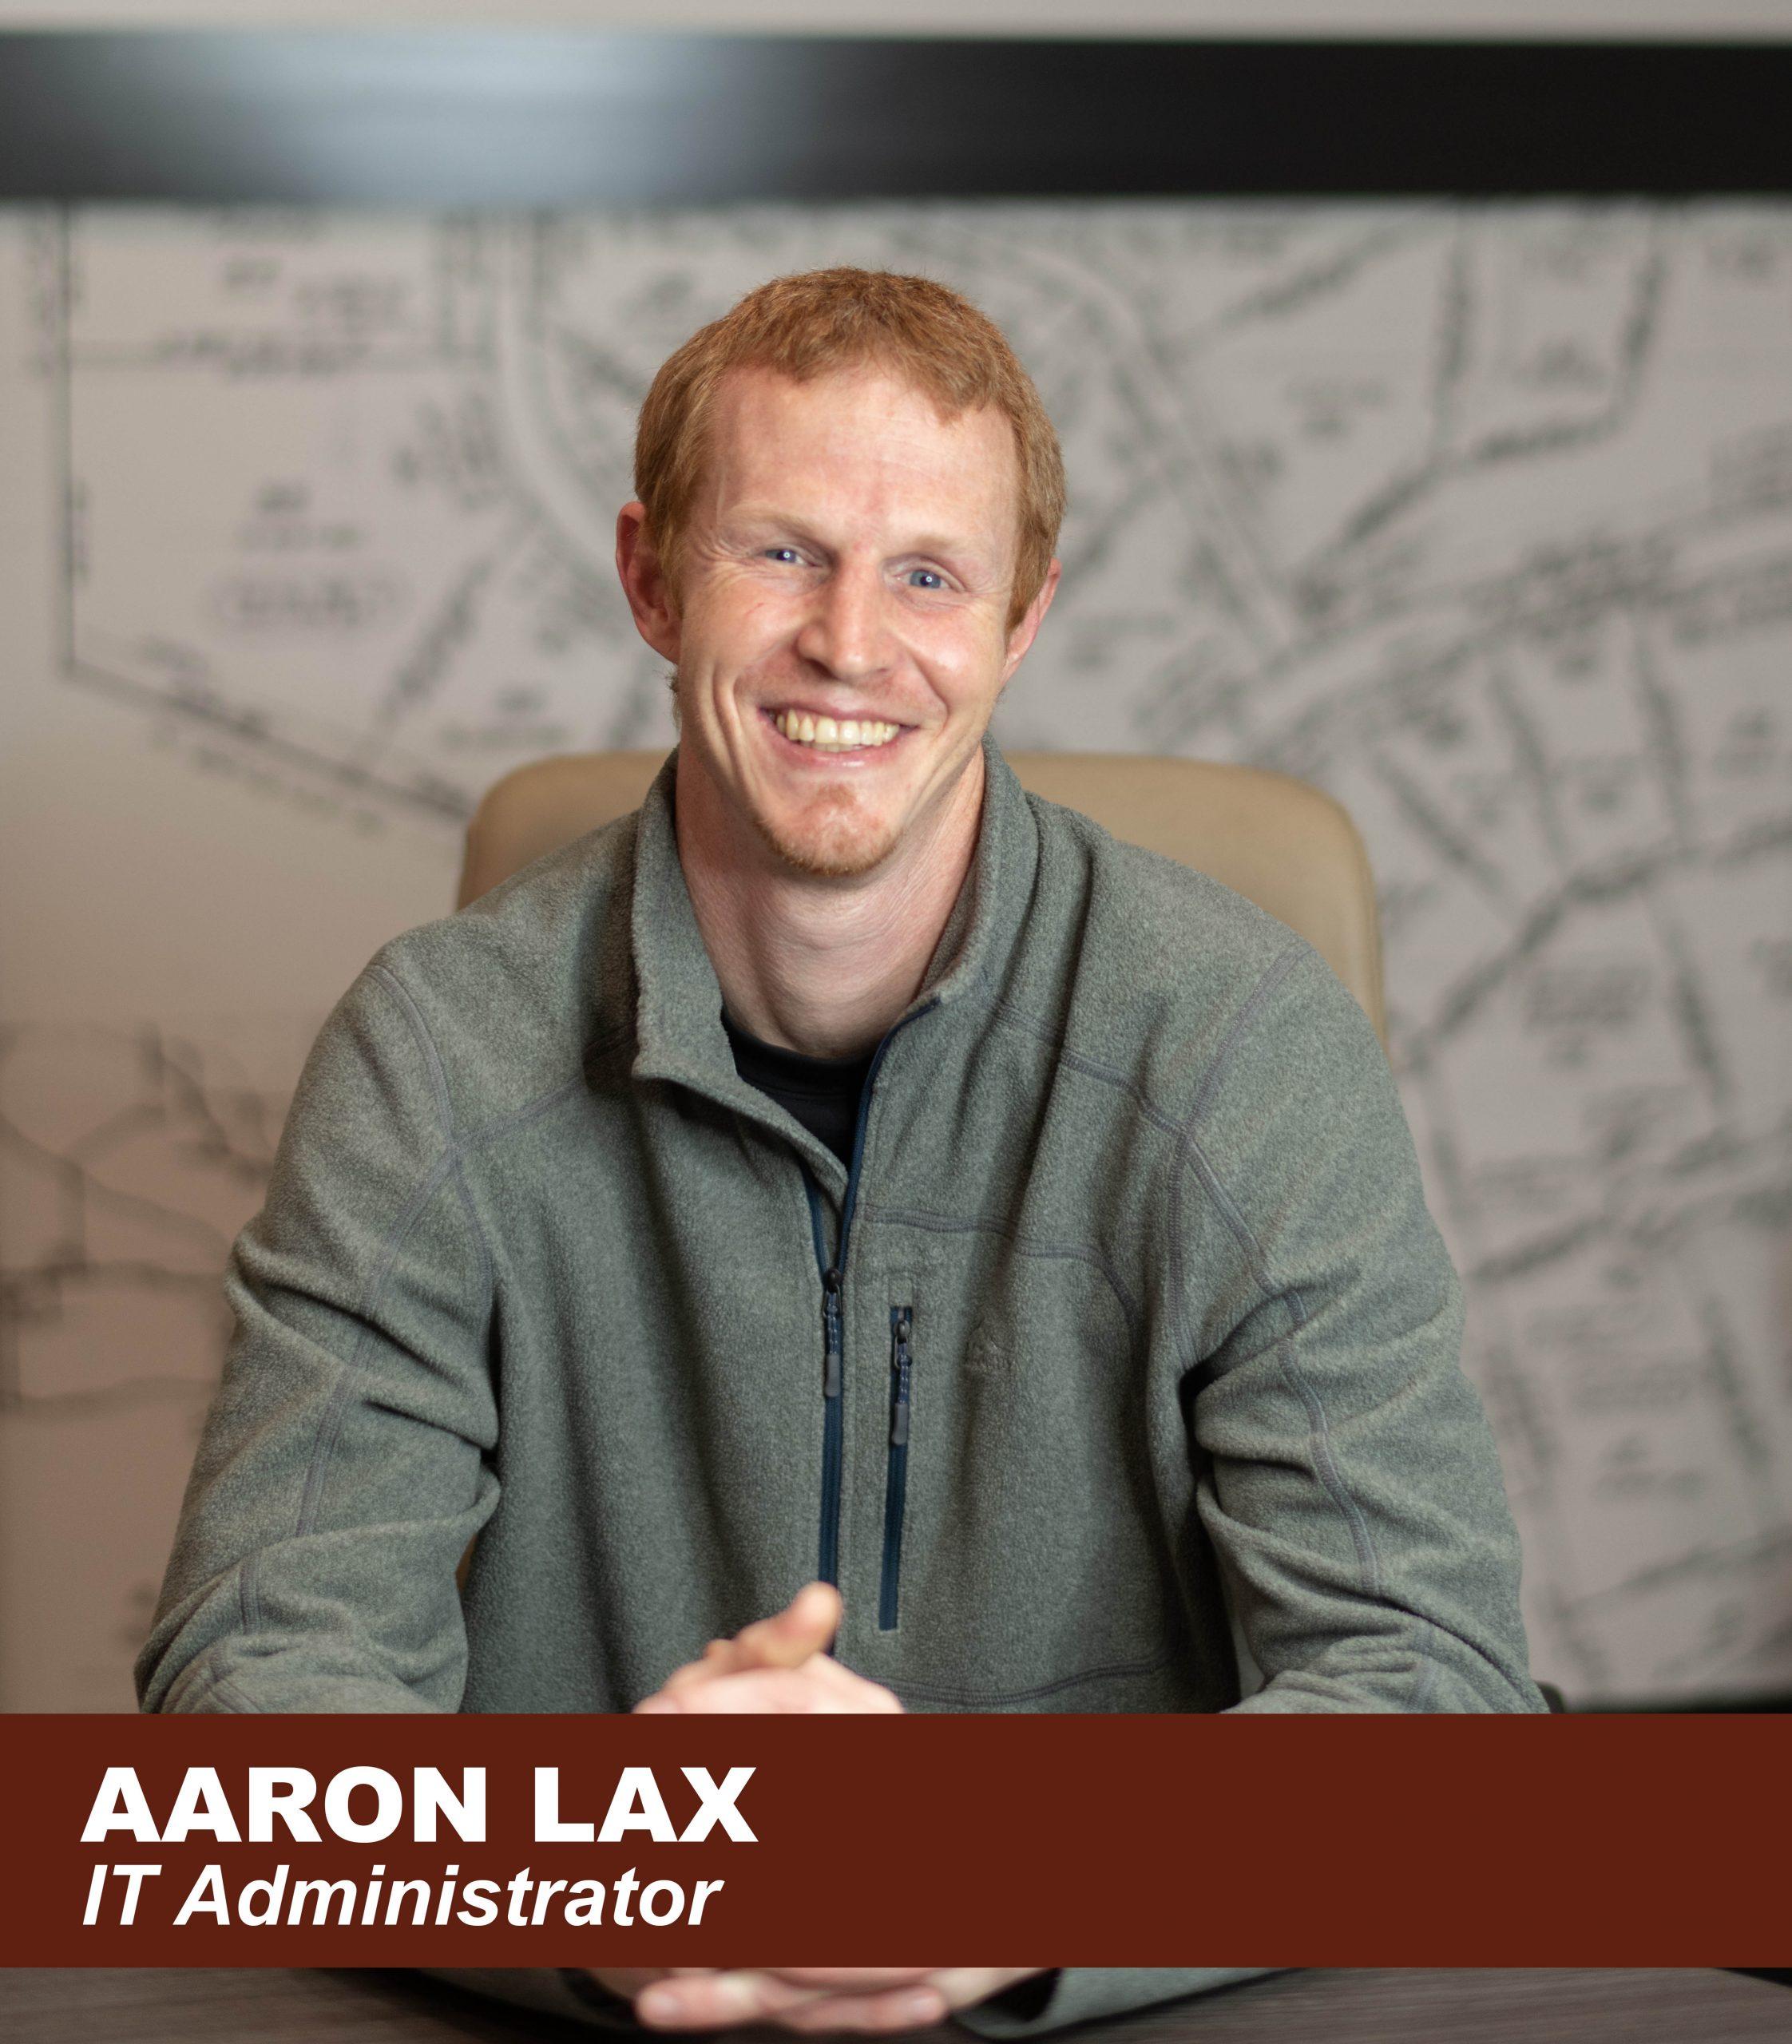 Aaron Lax